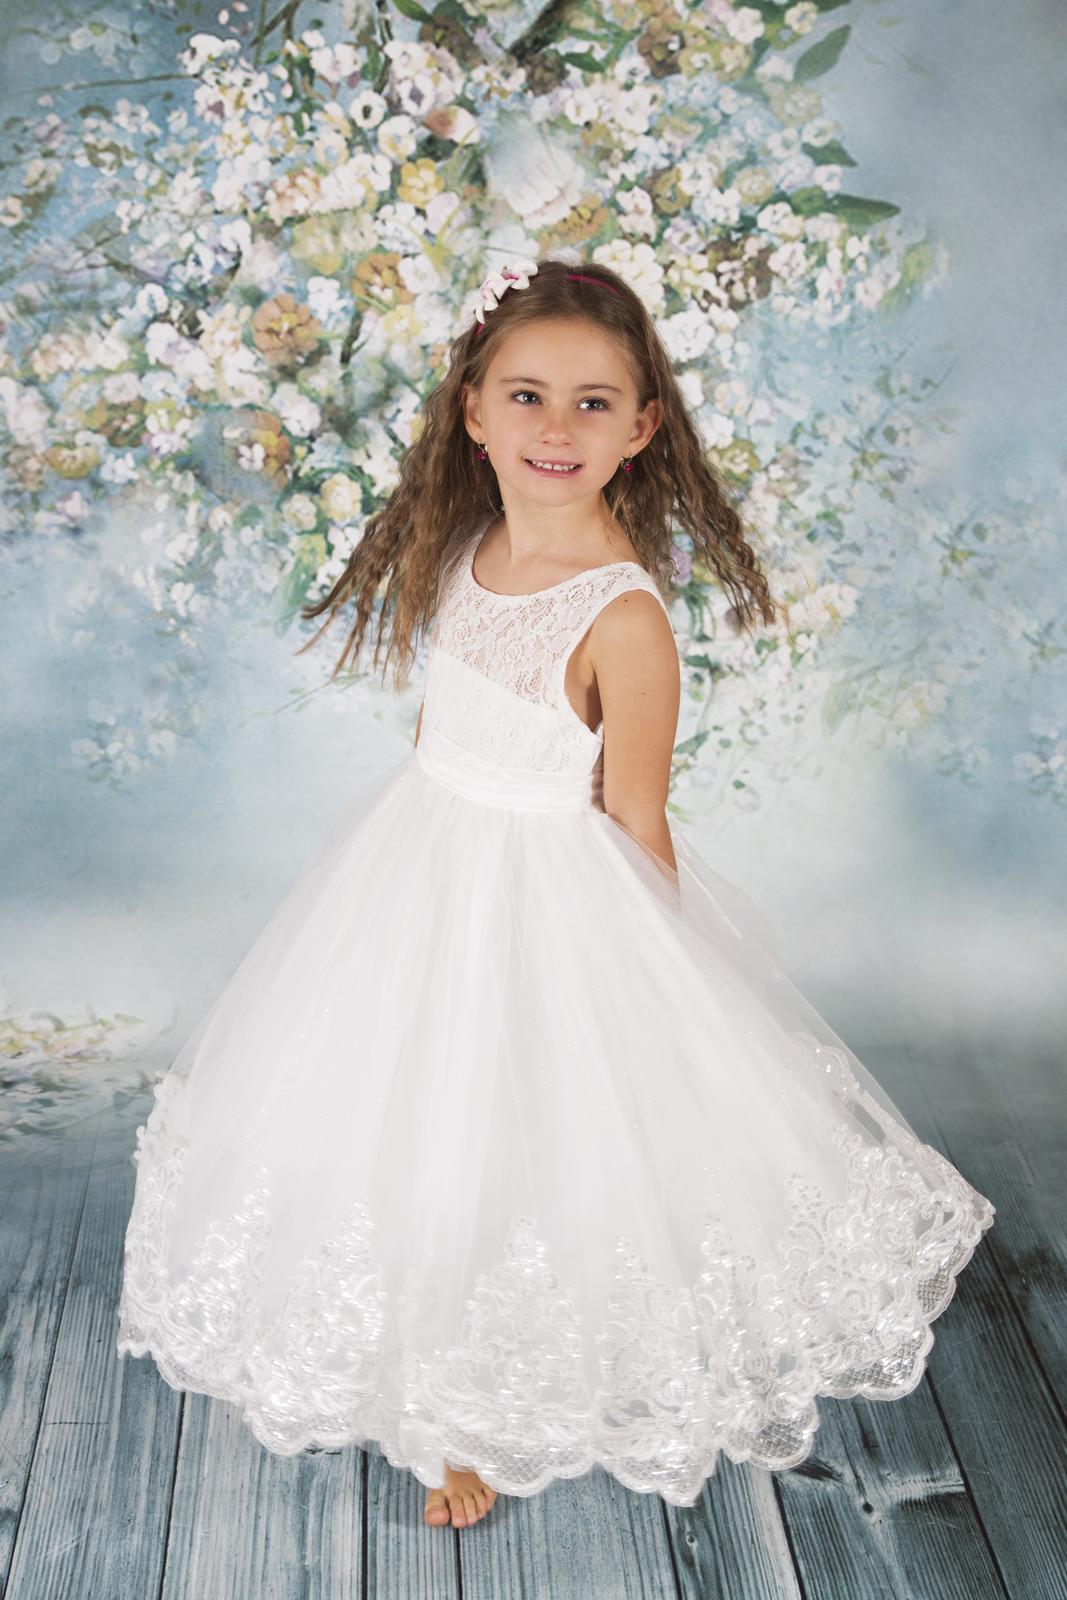 Šaty Isabel - Obrázek č. 1